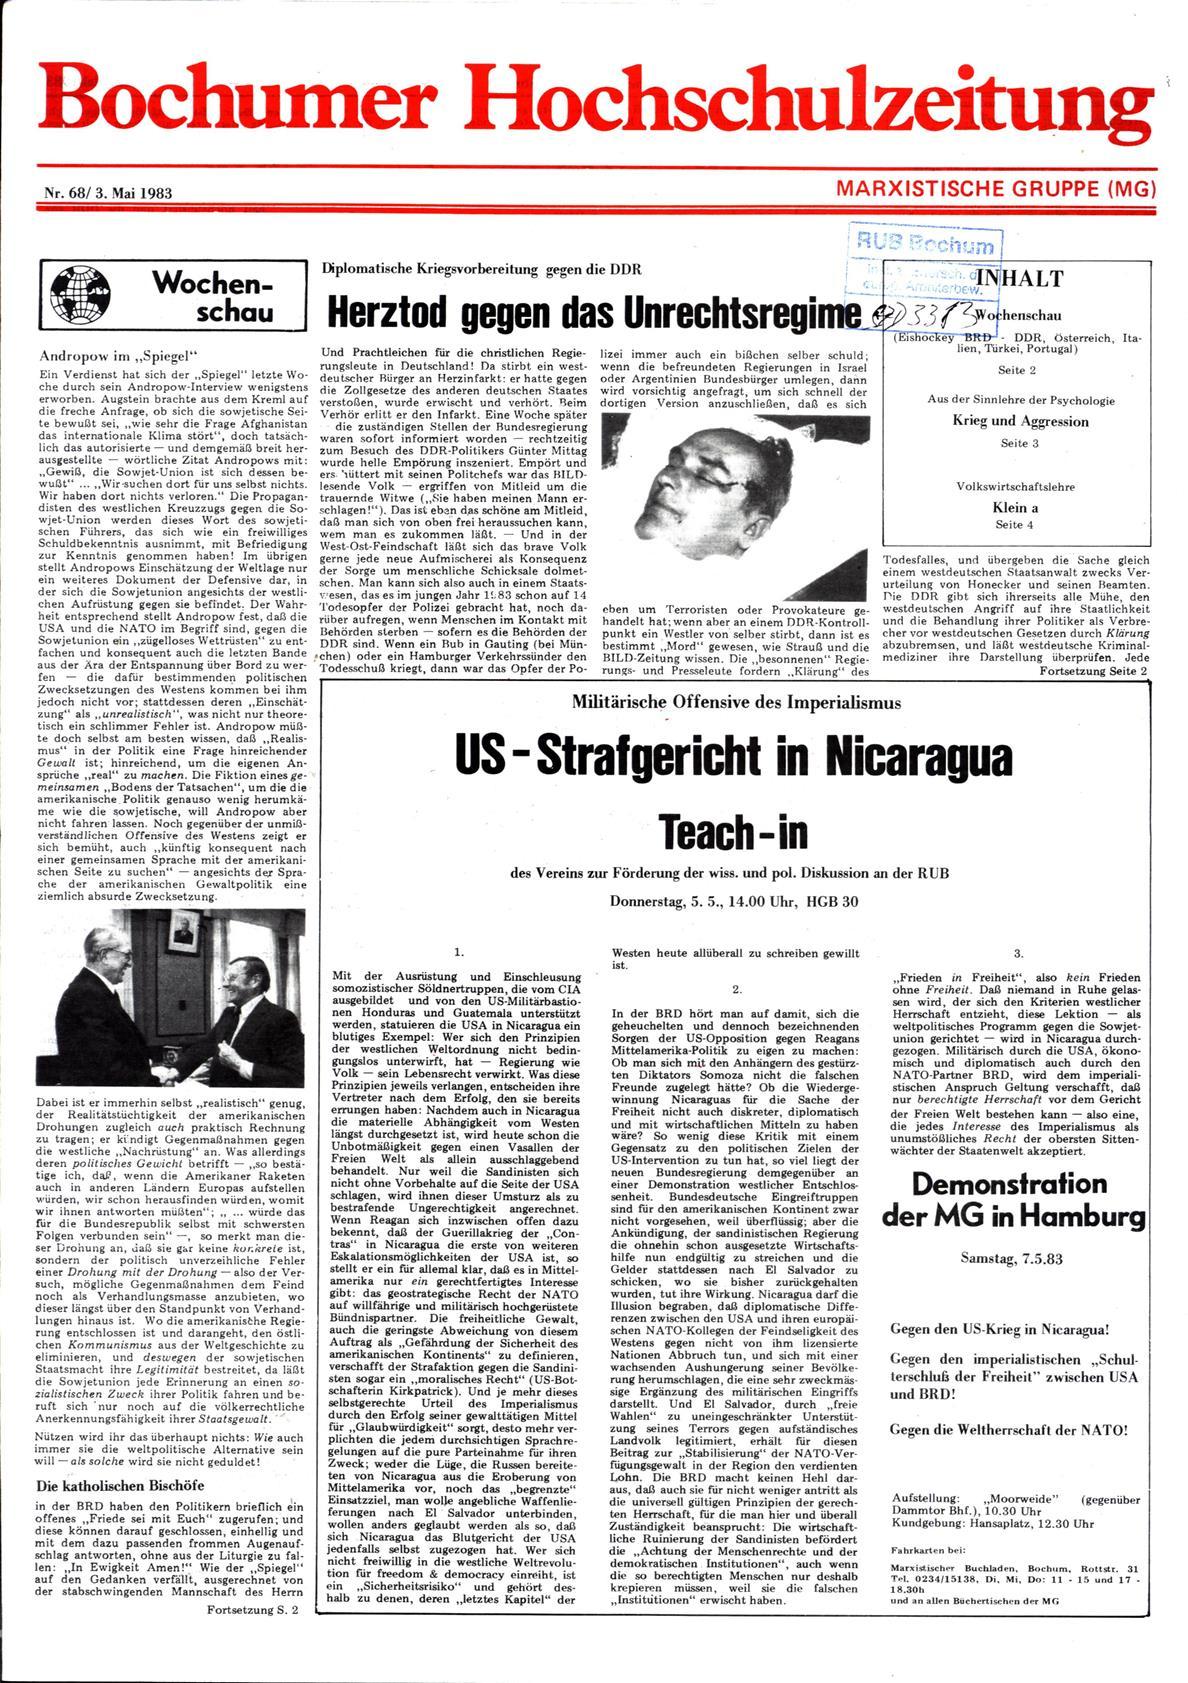 Bochum_BHZ_19830503_068_001